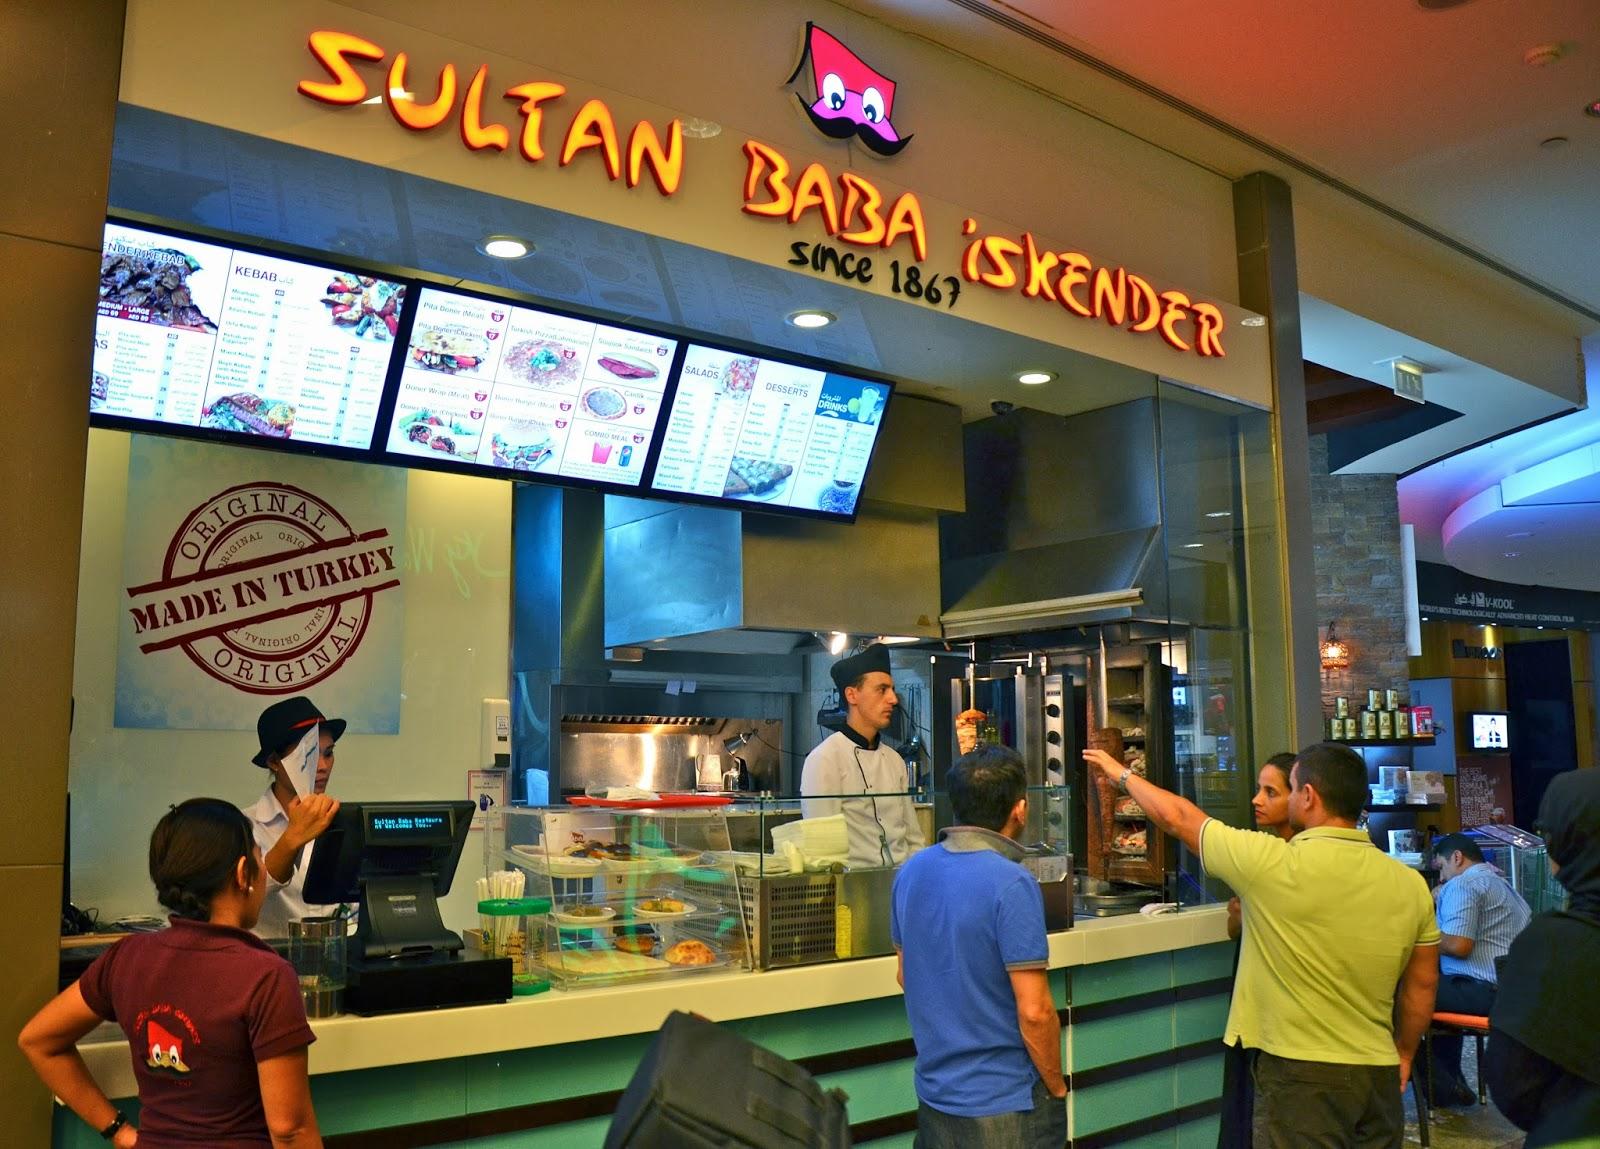 Living to EAT: Sultan Baba Iskendar - Dubai Festival City